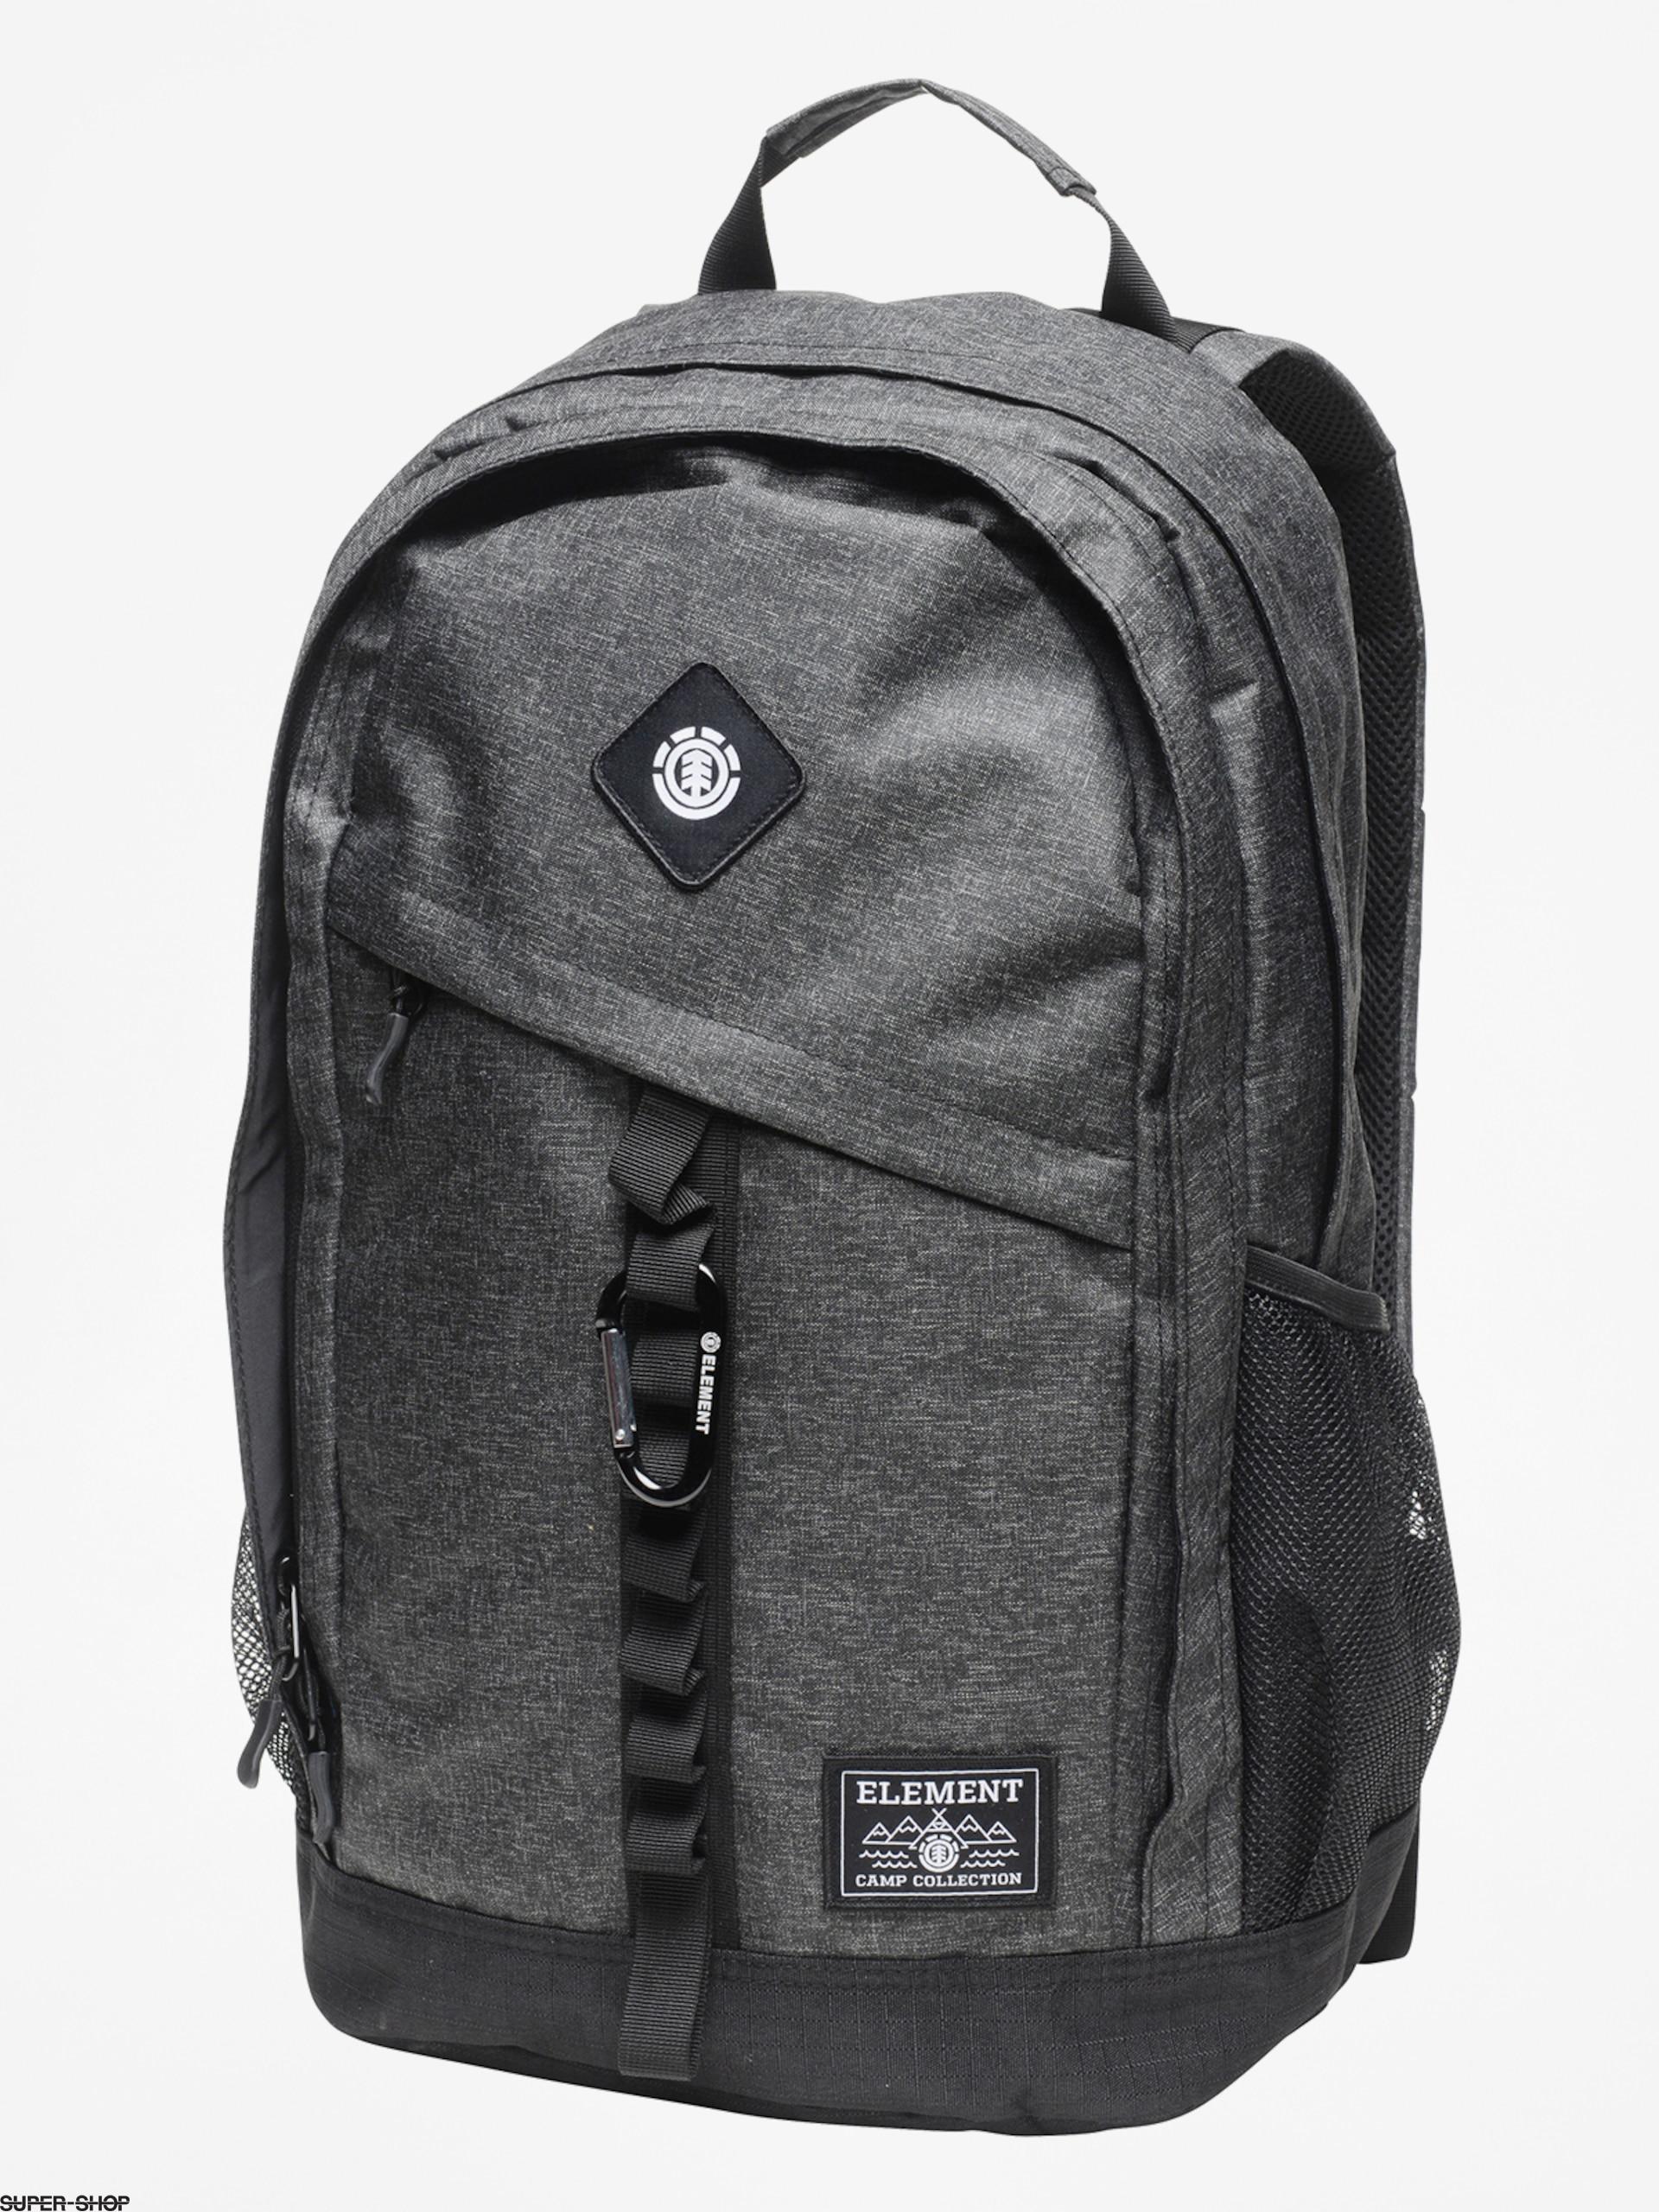 9ea9487275b4d 916453-w1920-element-backpack-cypress-black-grid-htr.jpg